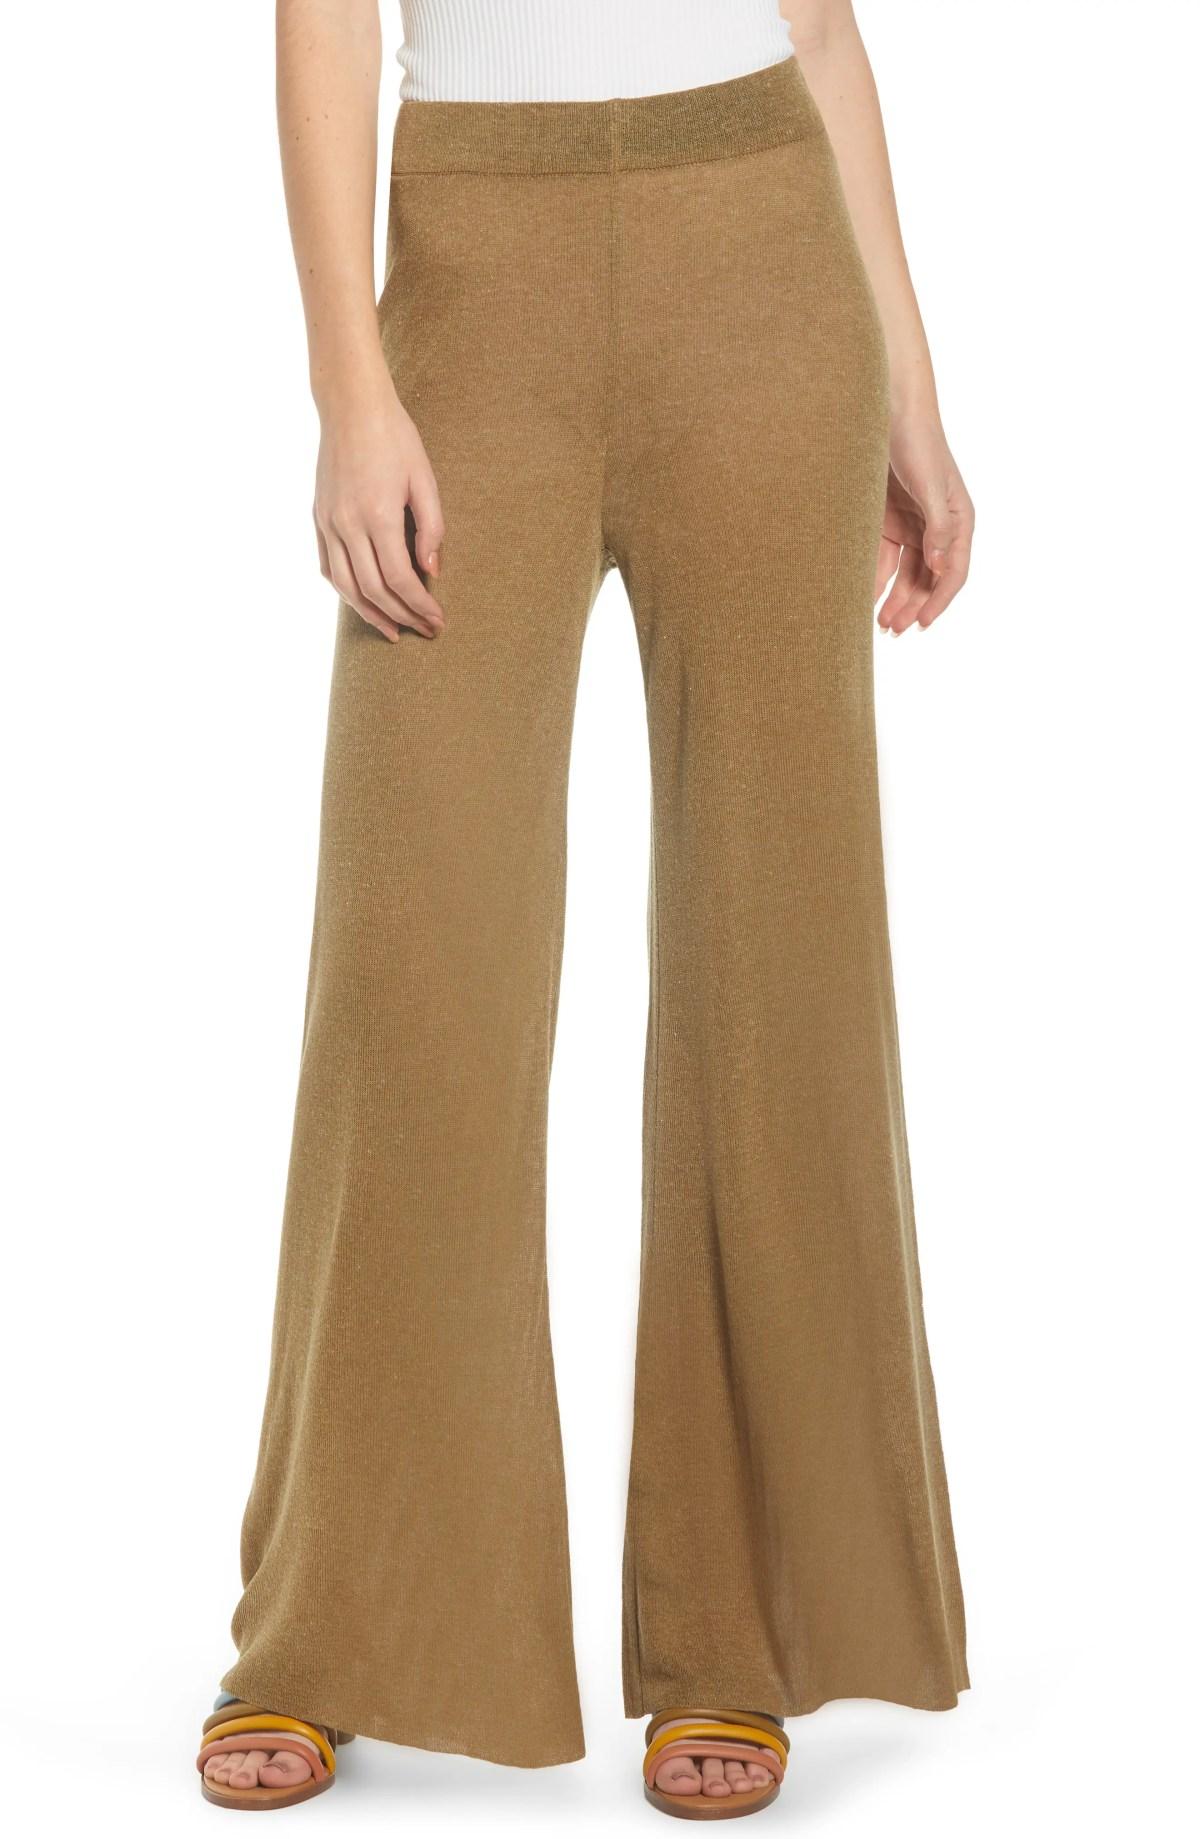 NOISY MAY Soren Knit Pants, Main, color, OLIVE DRAB